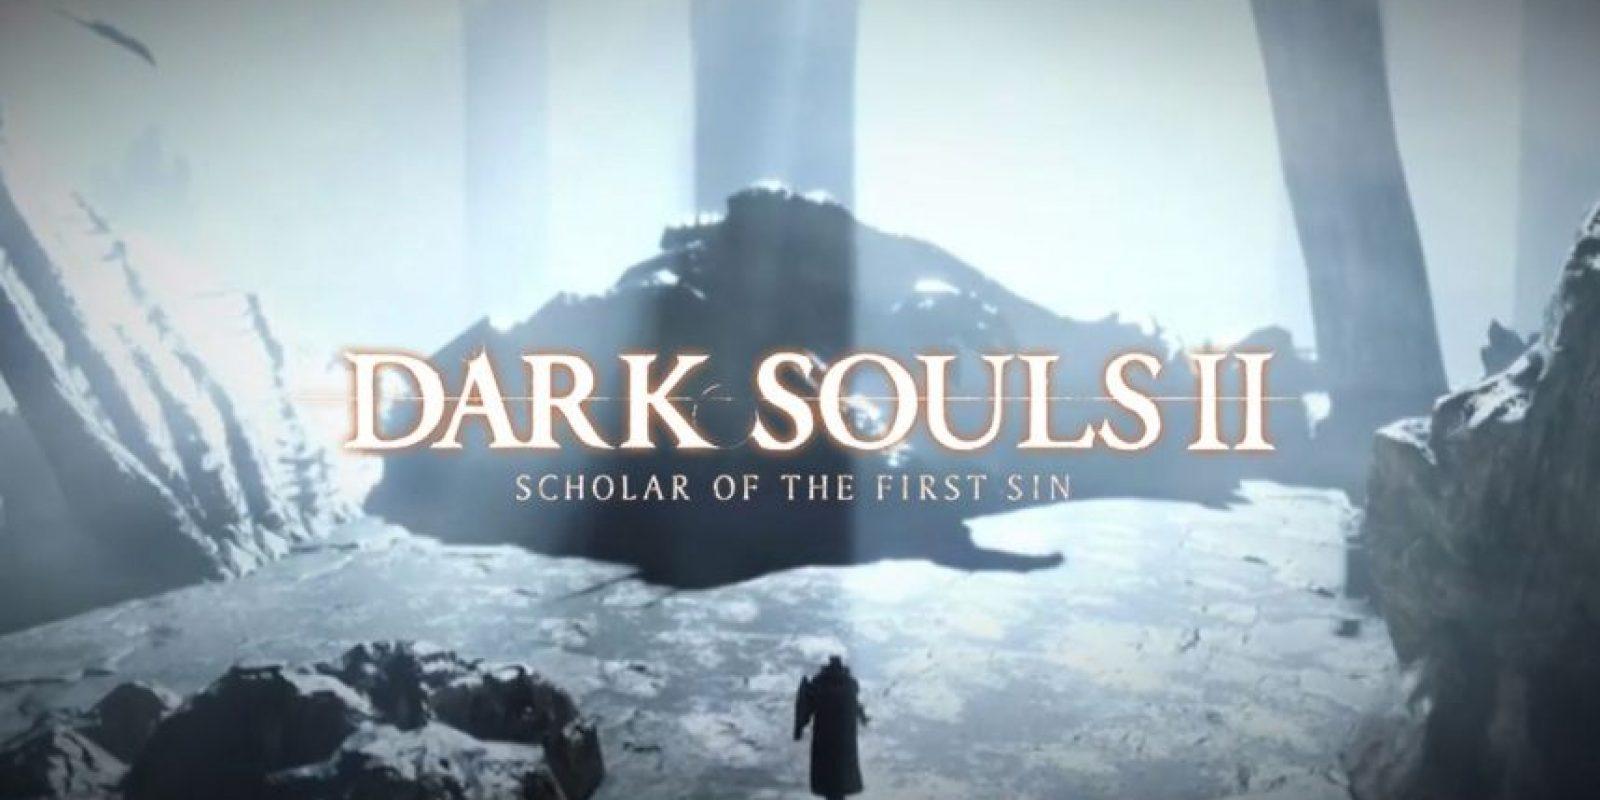 Dark Souls II: Scholar of the First Sin Foto:Namco Bandai Games